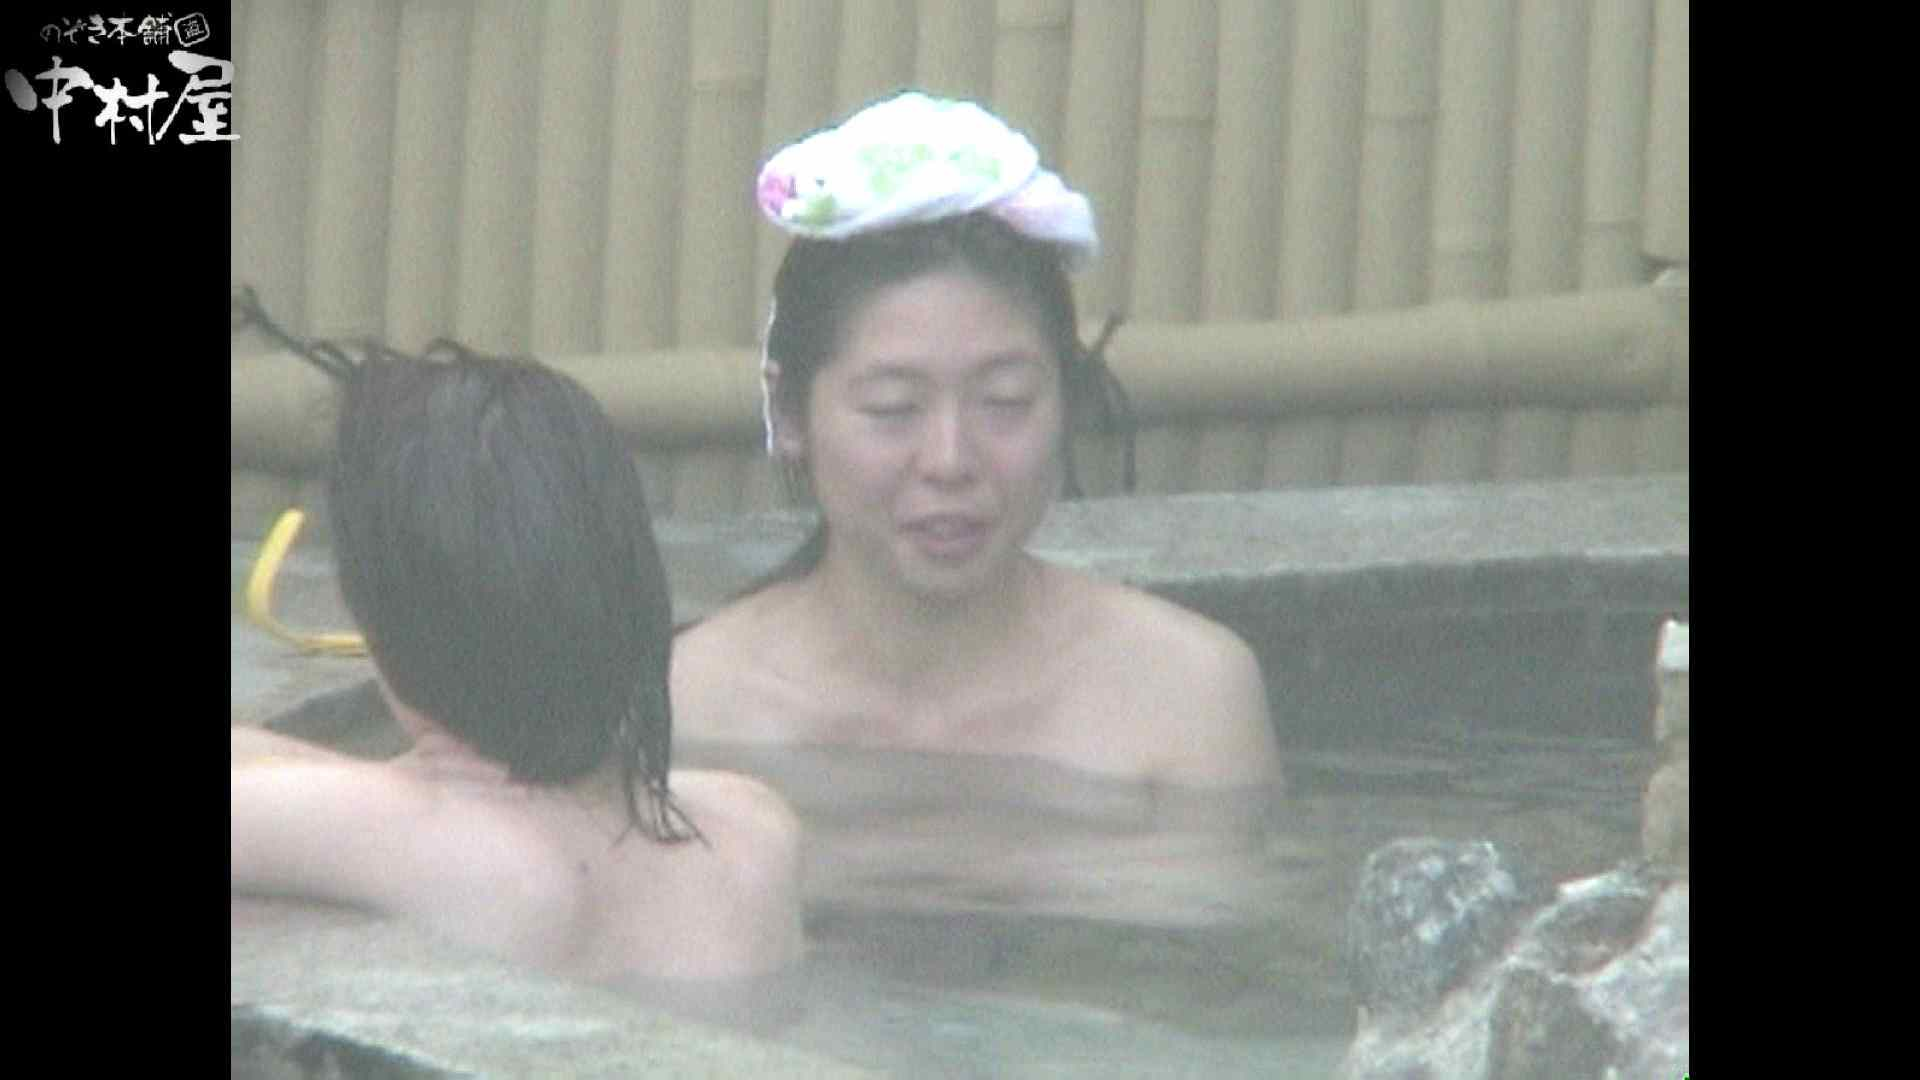 Aquaな露天風呂Vol.932 盗撮師作品 | 露天風呂突入  106pic 61